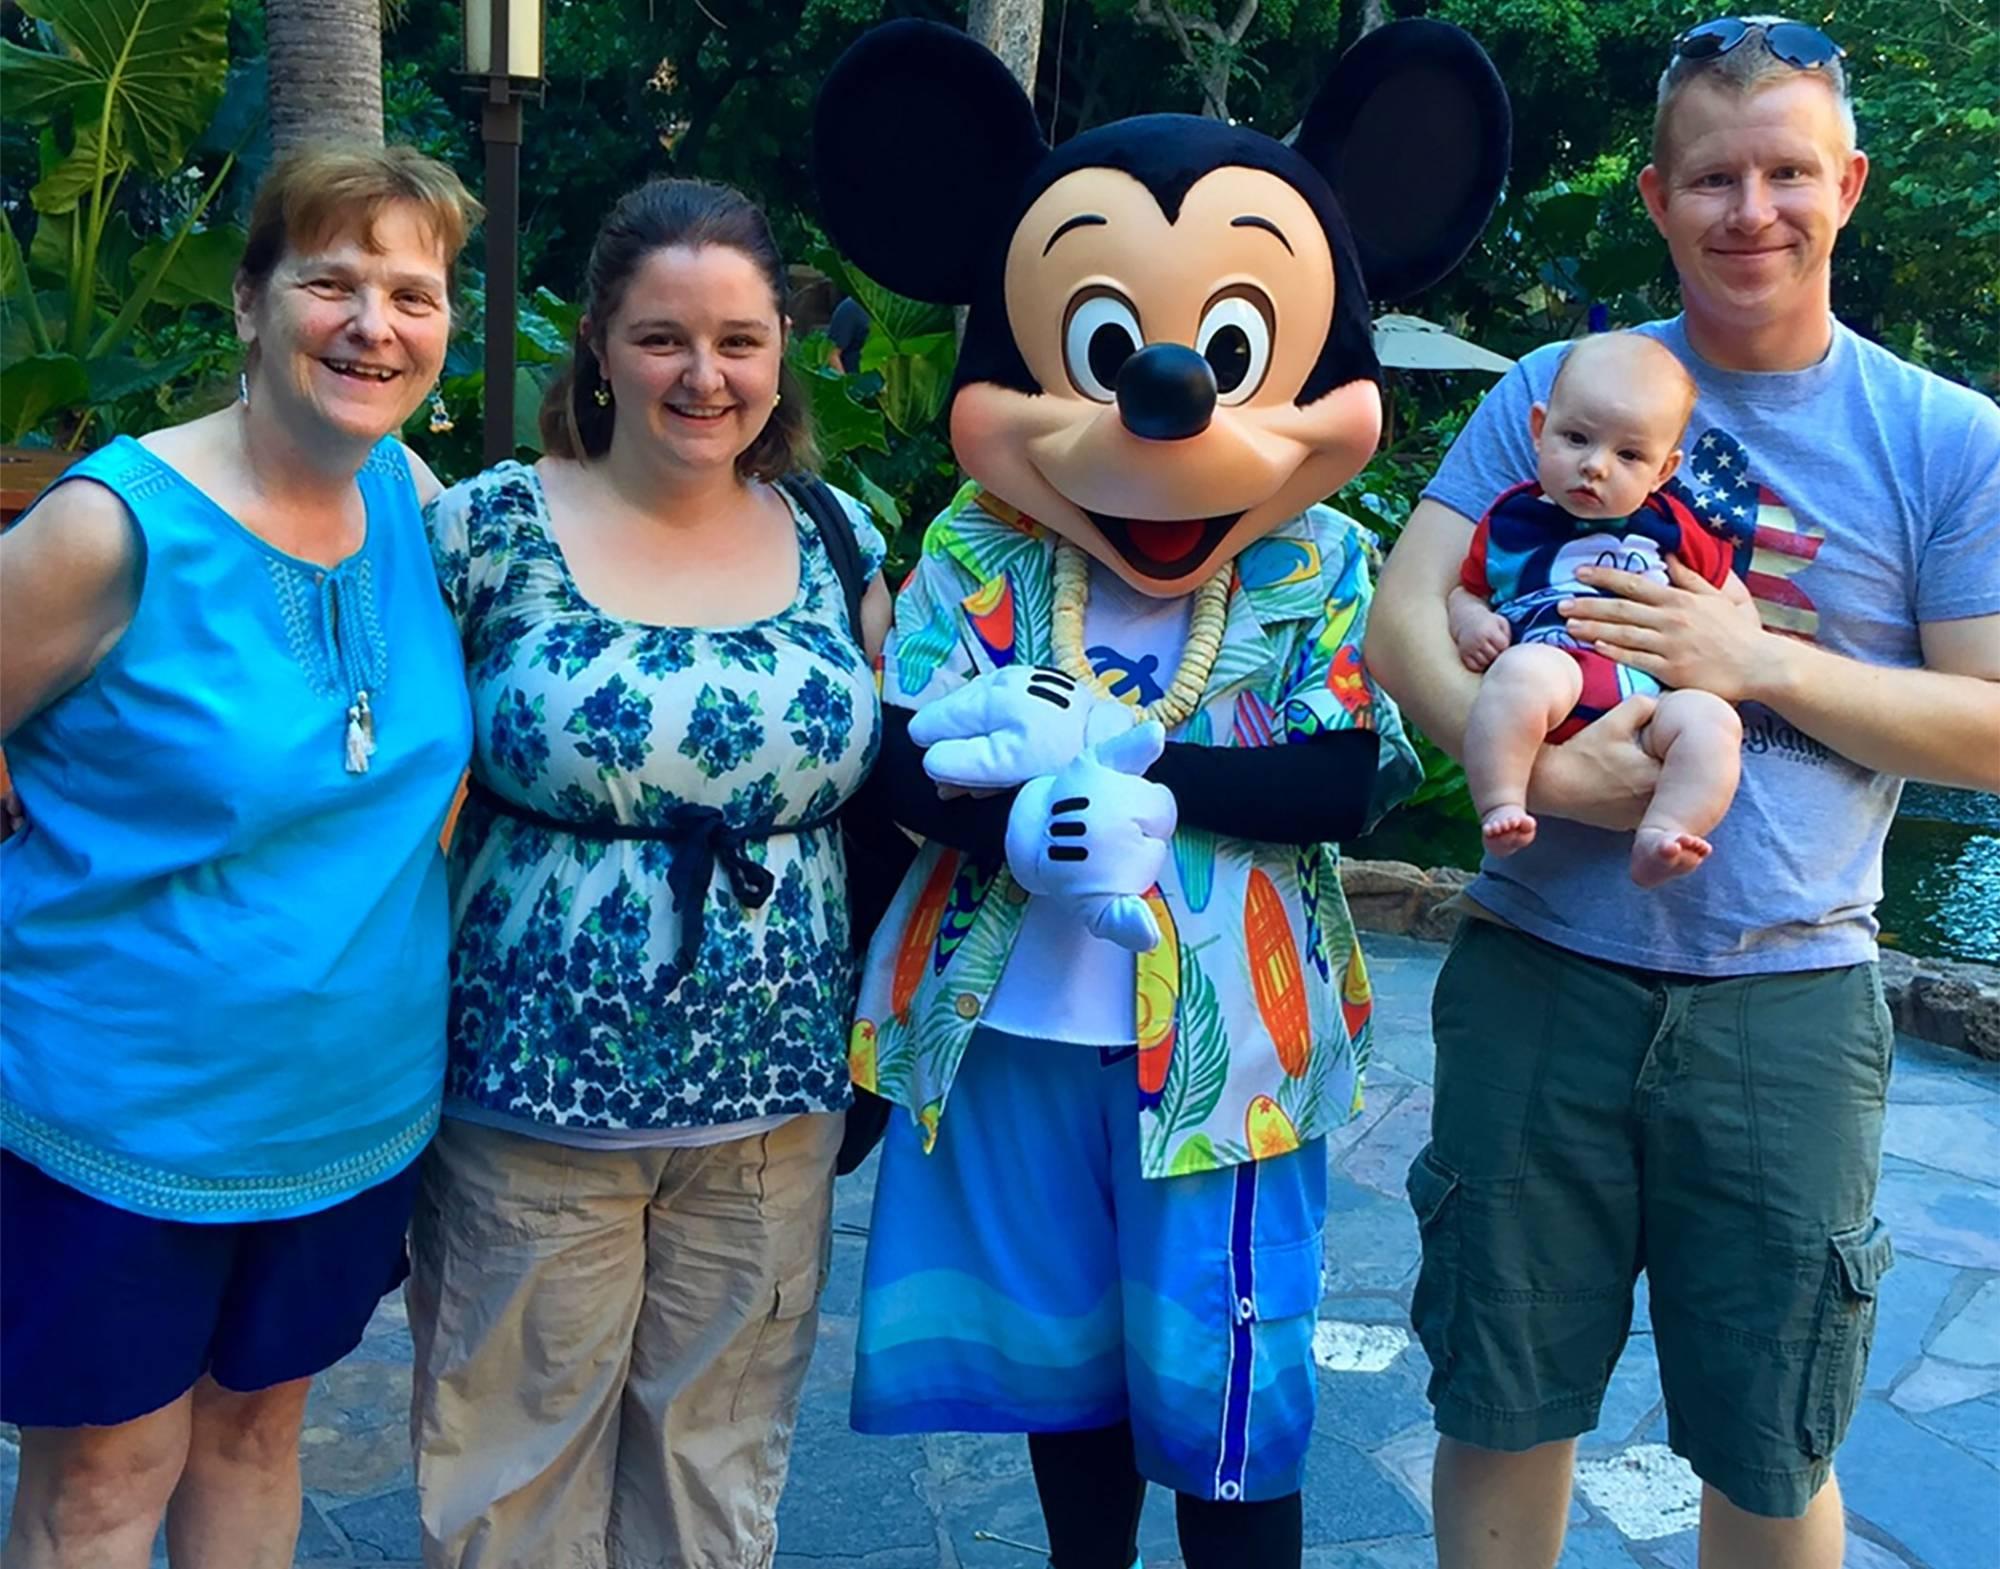 Enjoy breakfast with Mickey Mouse at Aulani - A Disney Resort and Spa in Ko Olina, Hawaii |PassPorter.com